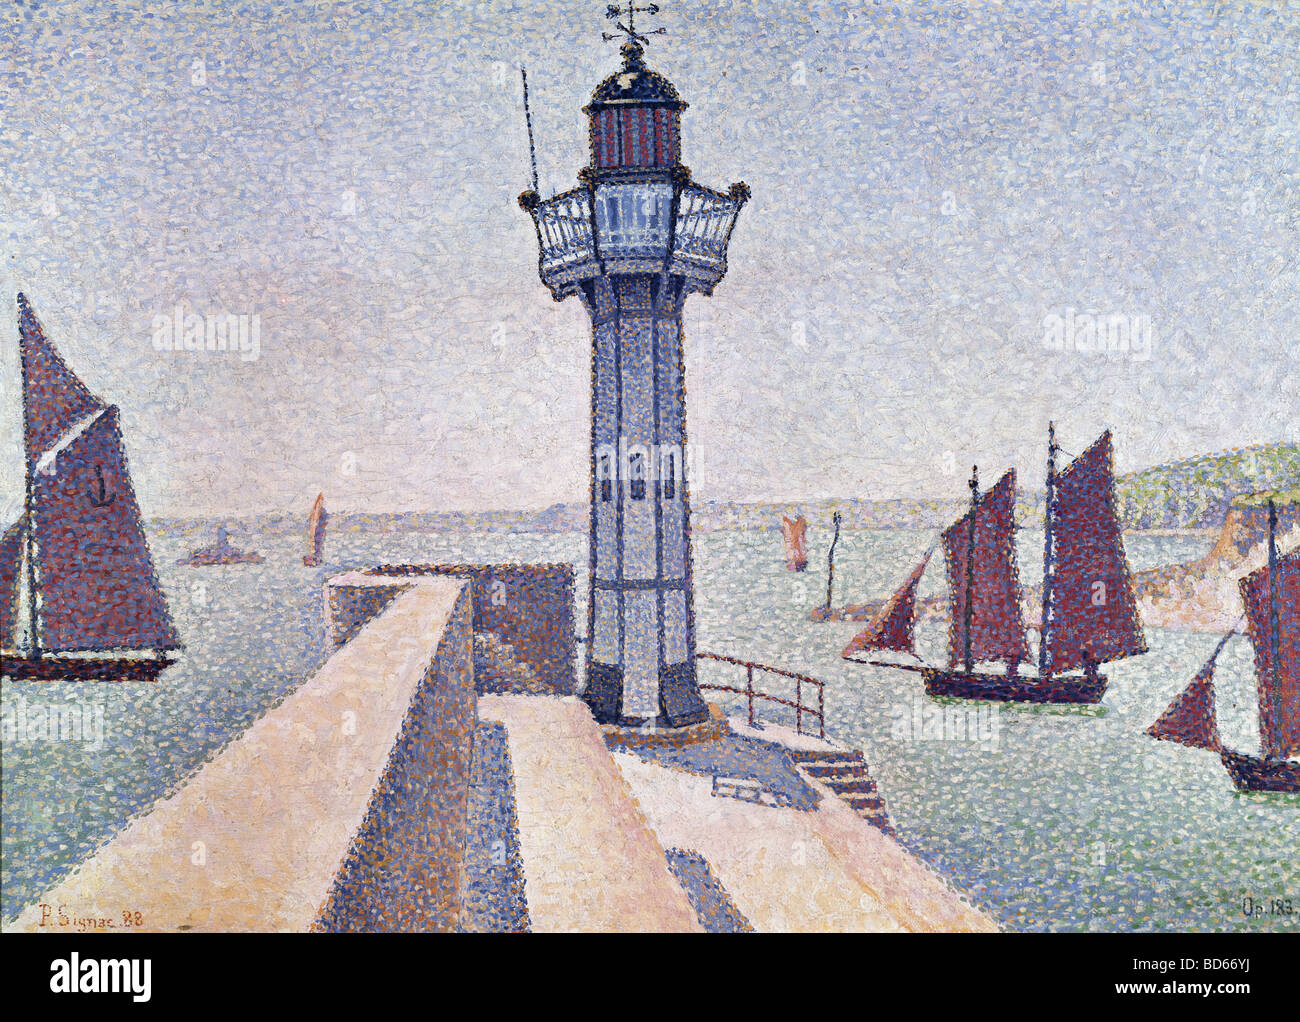 Bellas artes, Signac, Paul (1863 - 1935), pintura, 'Portrieux, Le Phare' de 1888, Rijksmuseum Kröller-Müller, Otterlo, Foto de stock